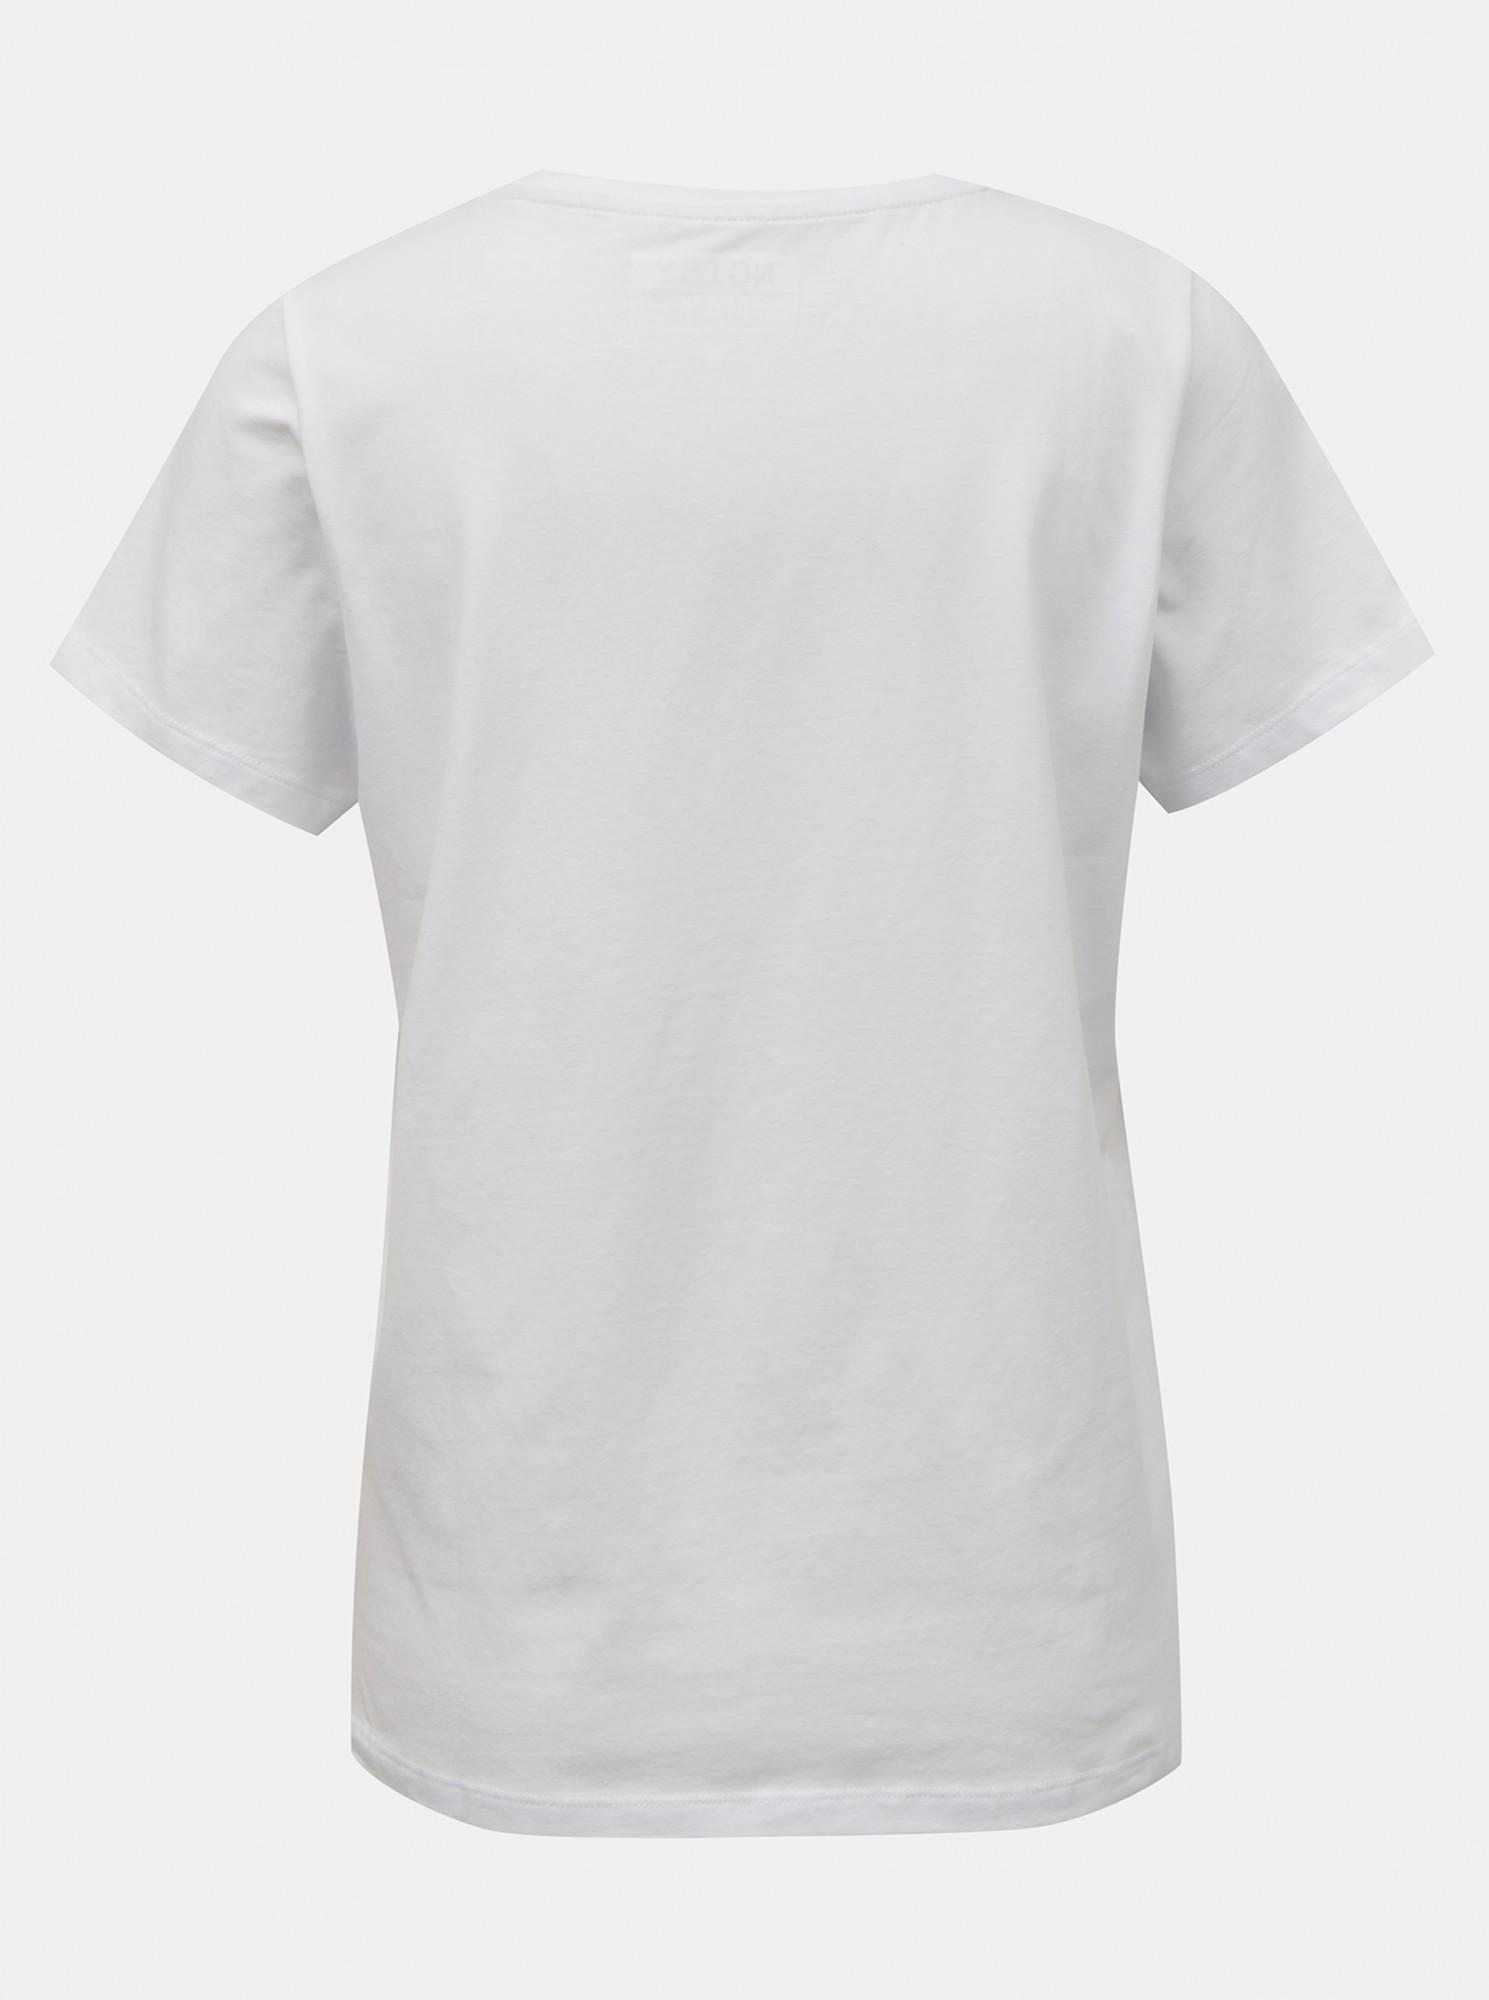 Noisy May Maglietta donna bianco Nate